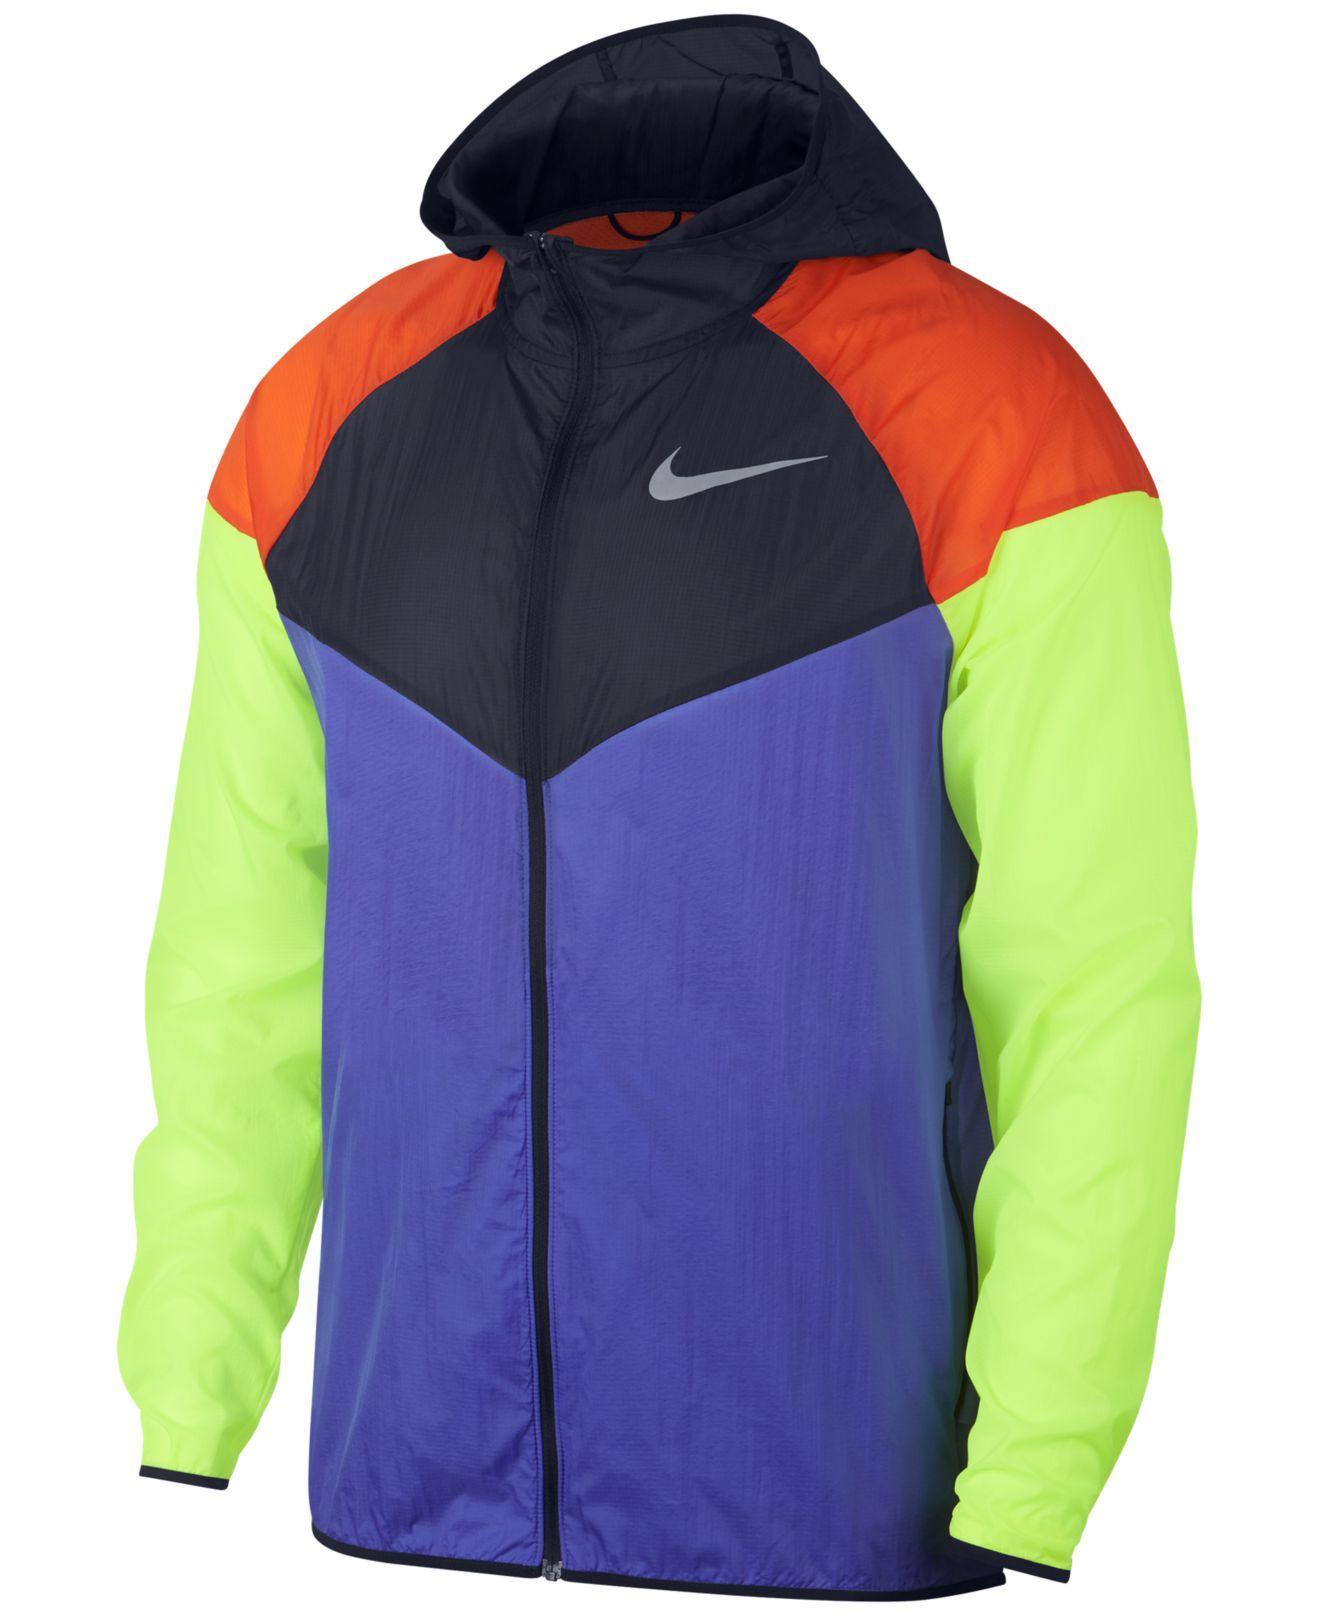 bcf4dfe8f70e Lyst - Nike Colorblocked Water-repellent Windrunner Jacket in Purple ...